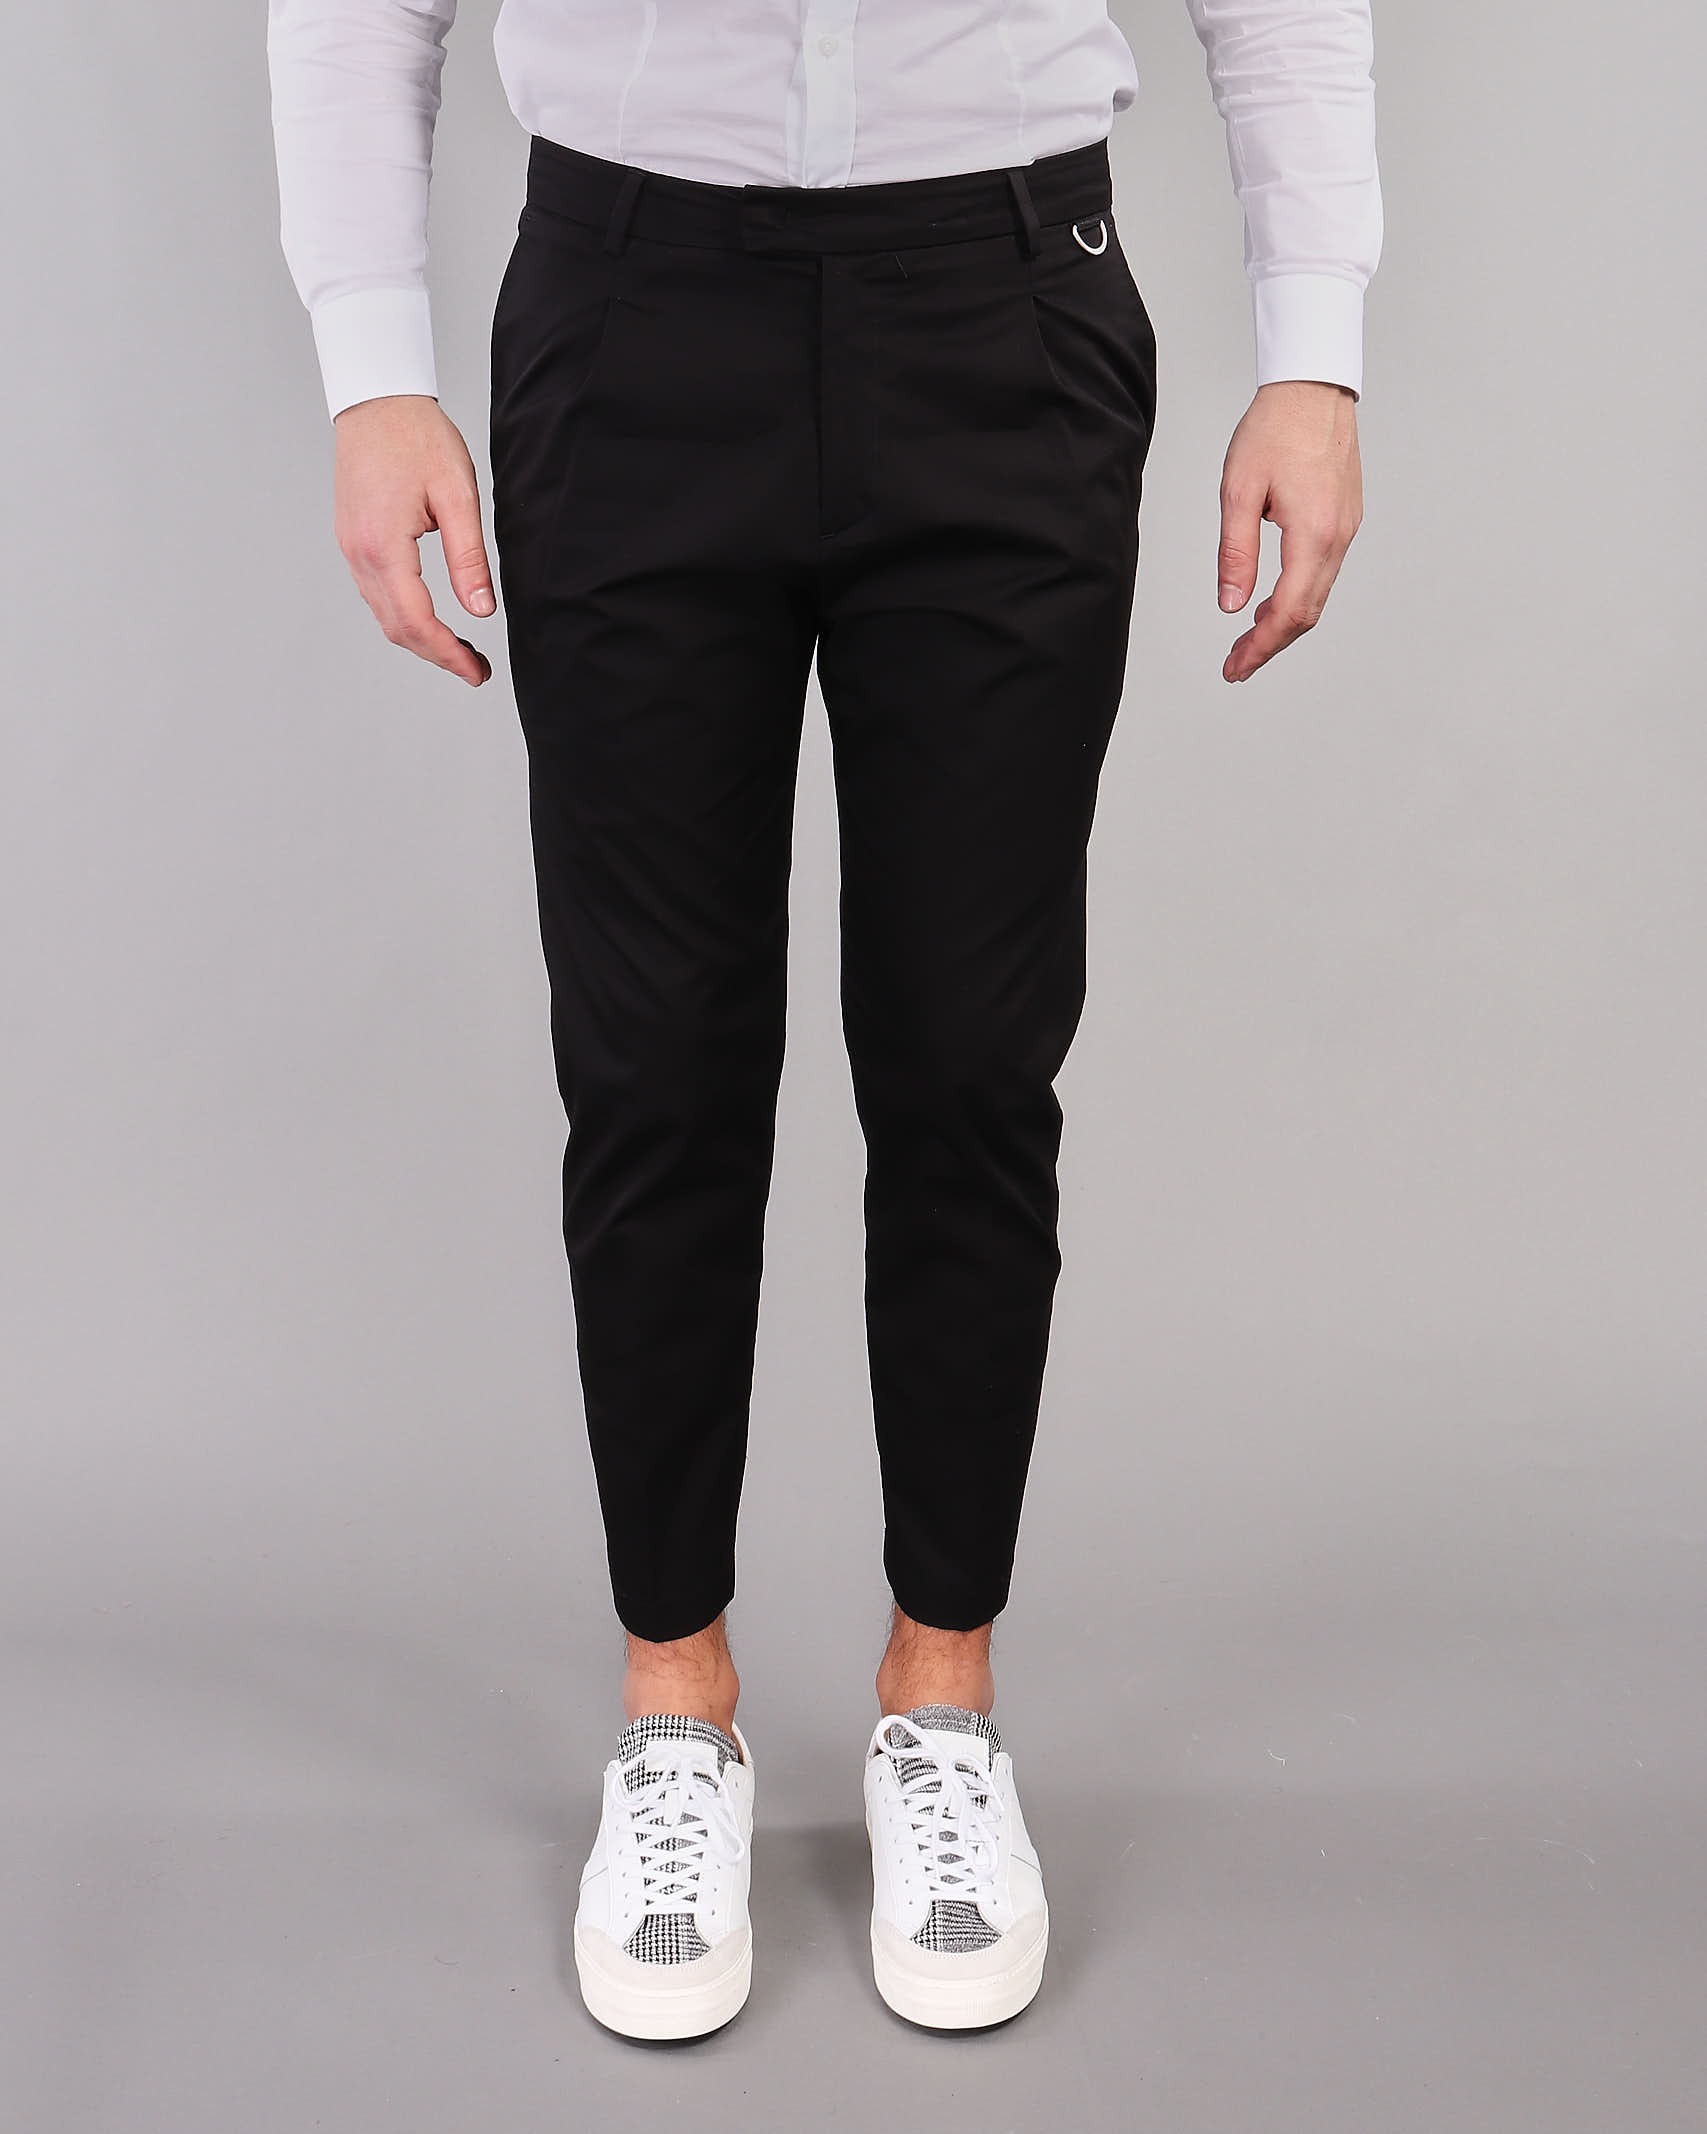 Pantalone in cotone con pences Low Brand LOW BRAND | Pantalone | L1PSS215693D001